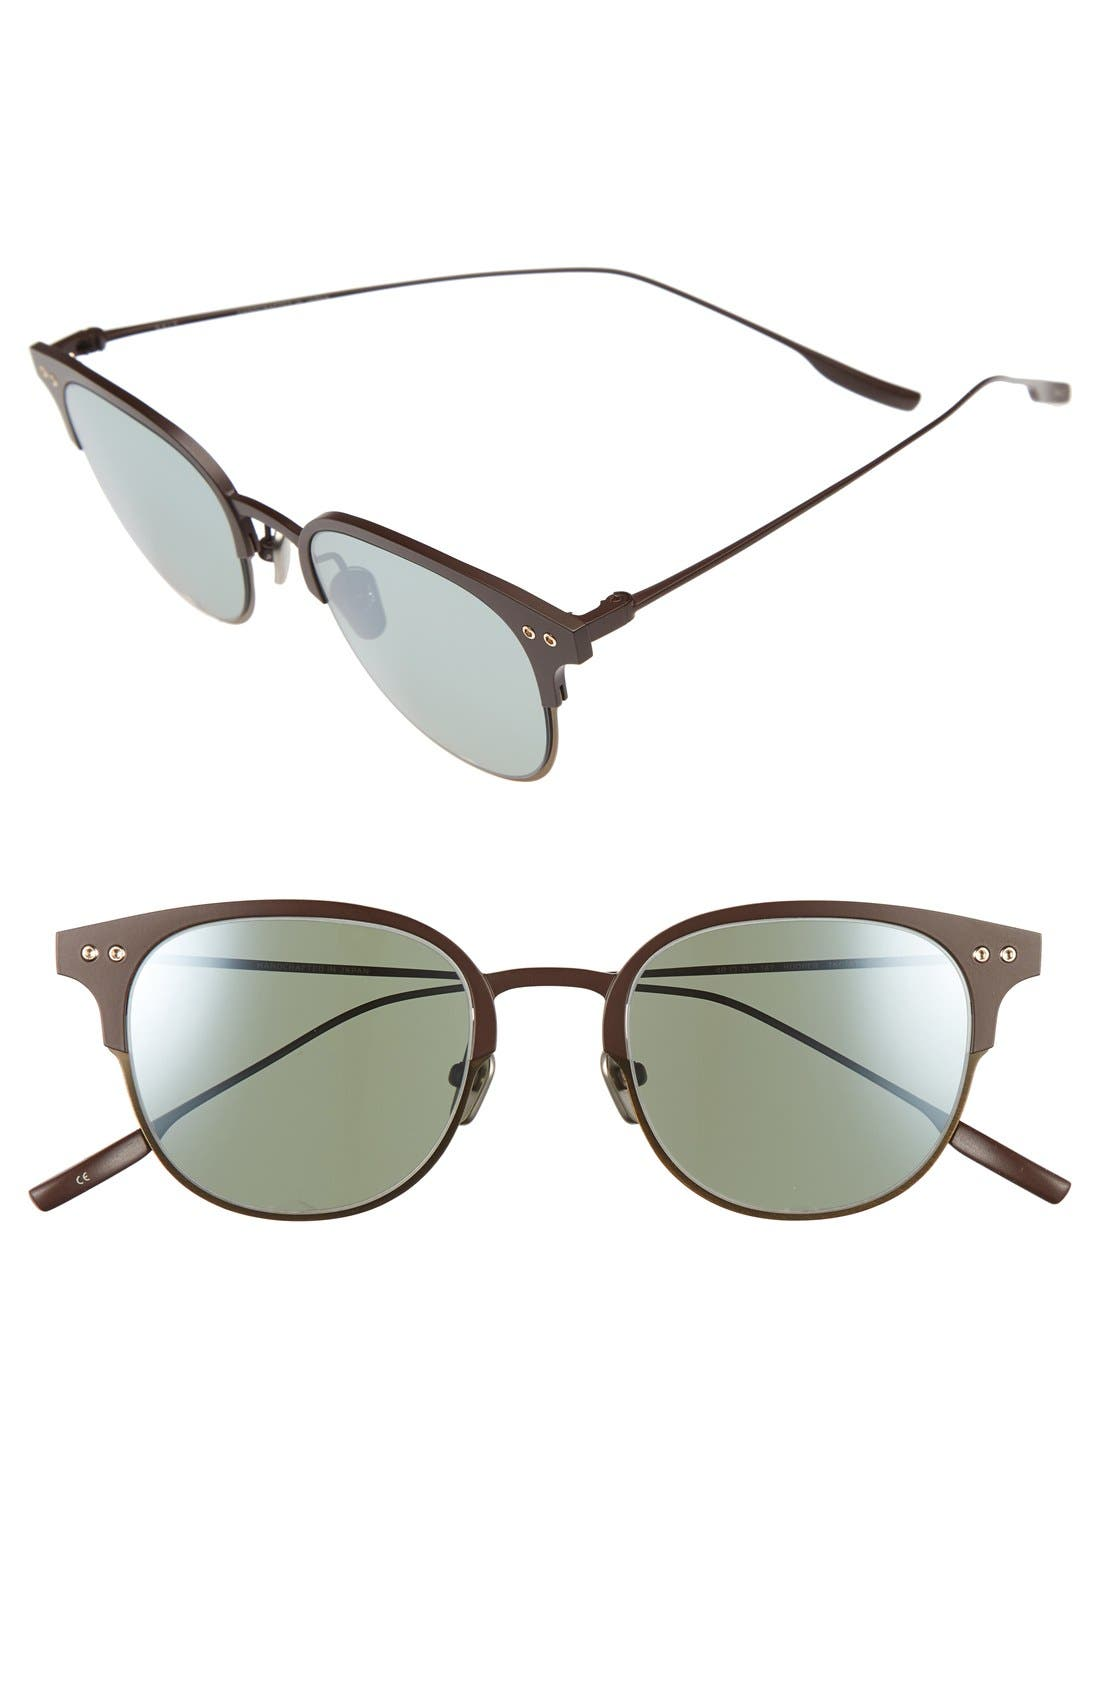 Hooper 48mm Polarized Sunglasses,                             Alternate thumbnail 2, color,                             220